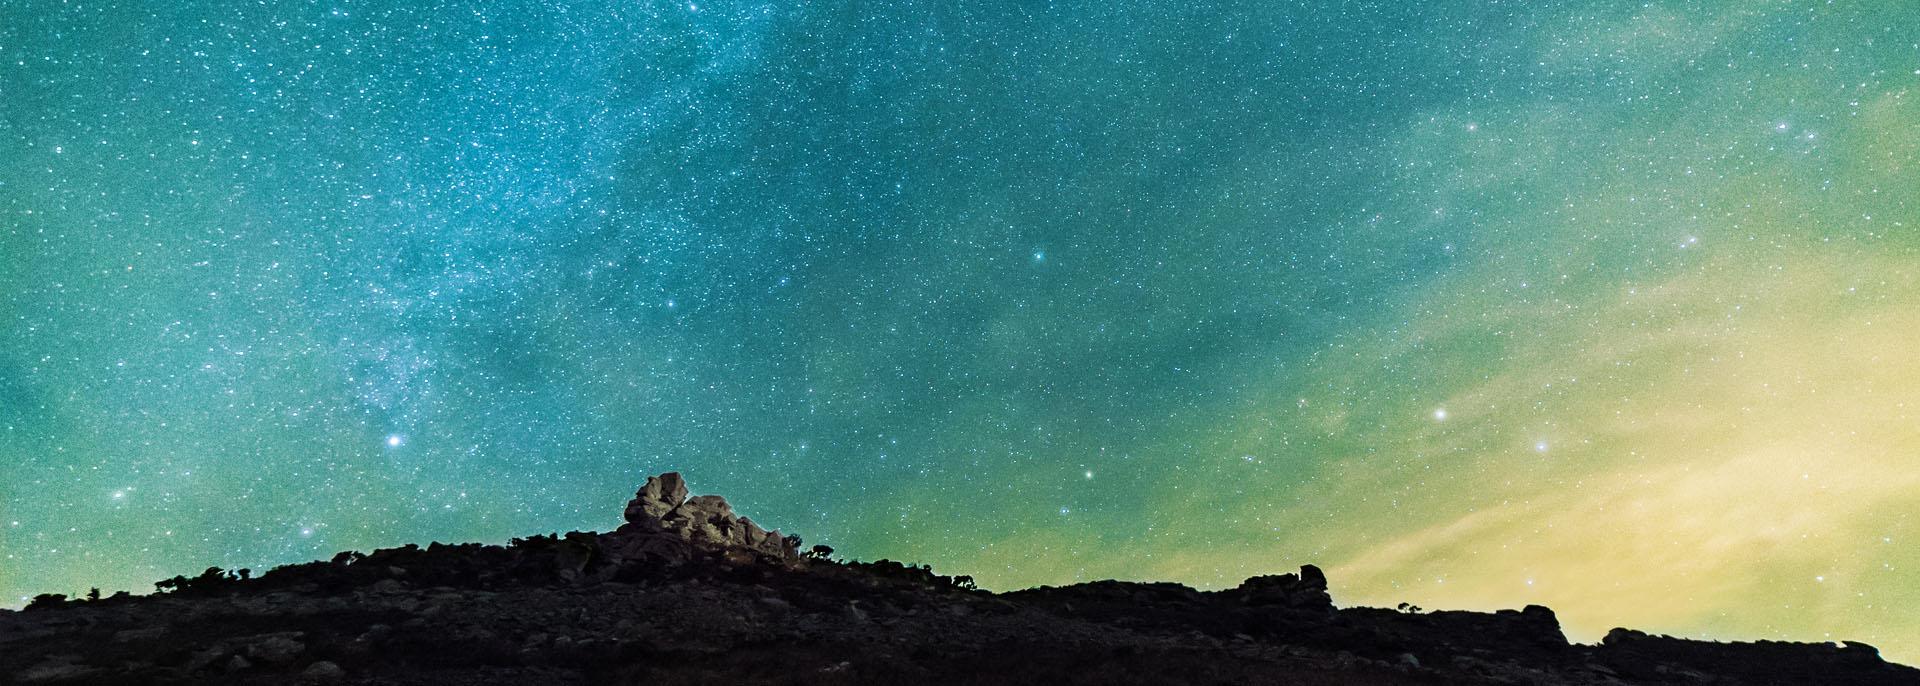 7_Starry_Skies_1920px